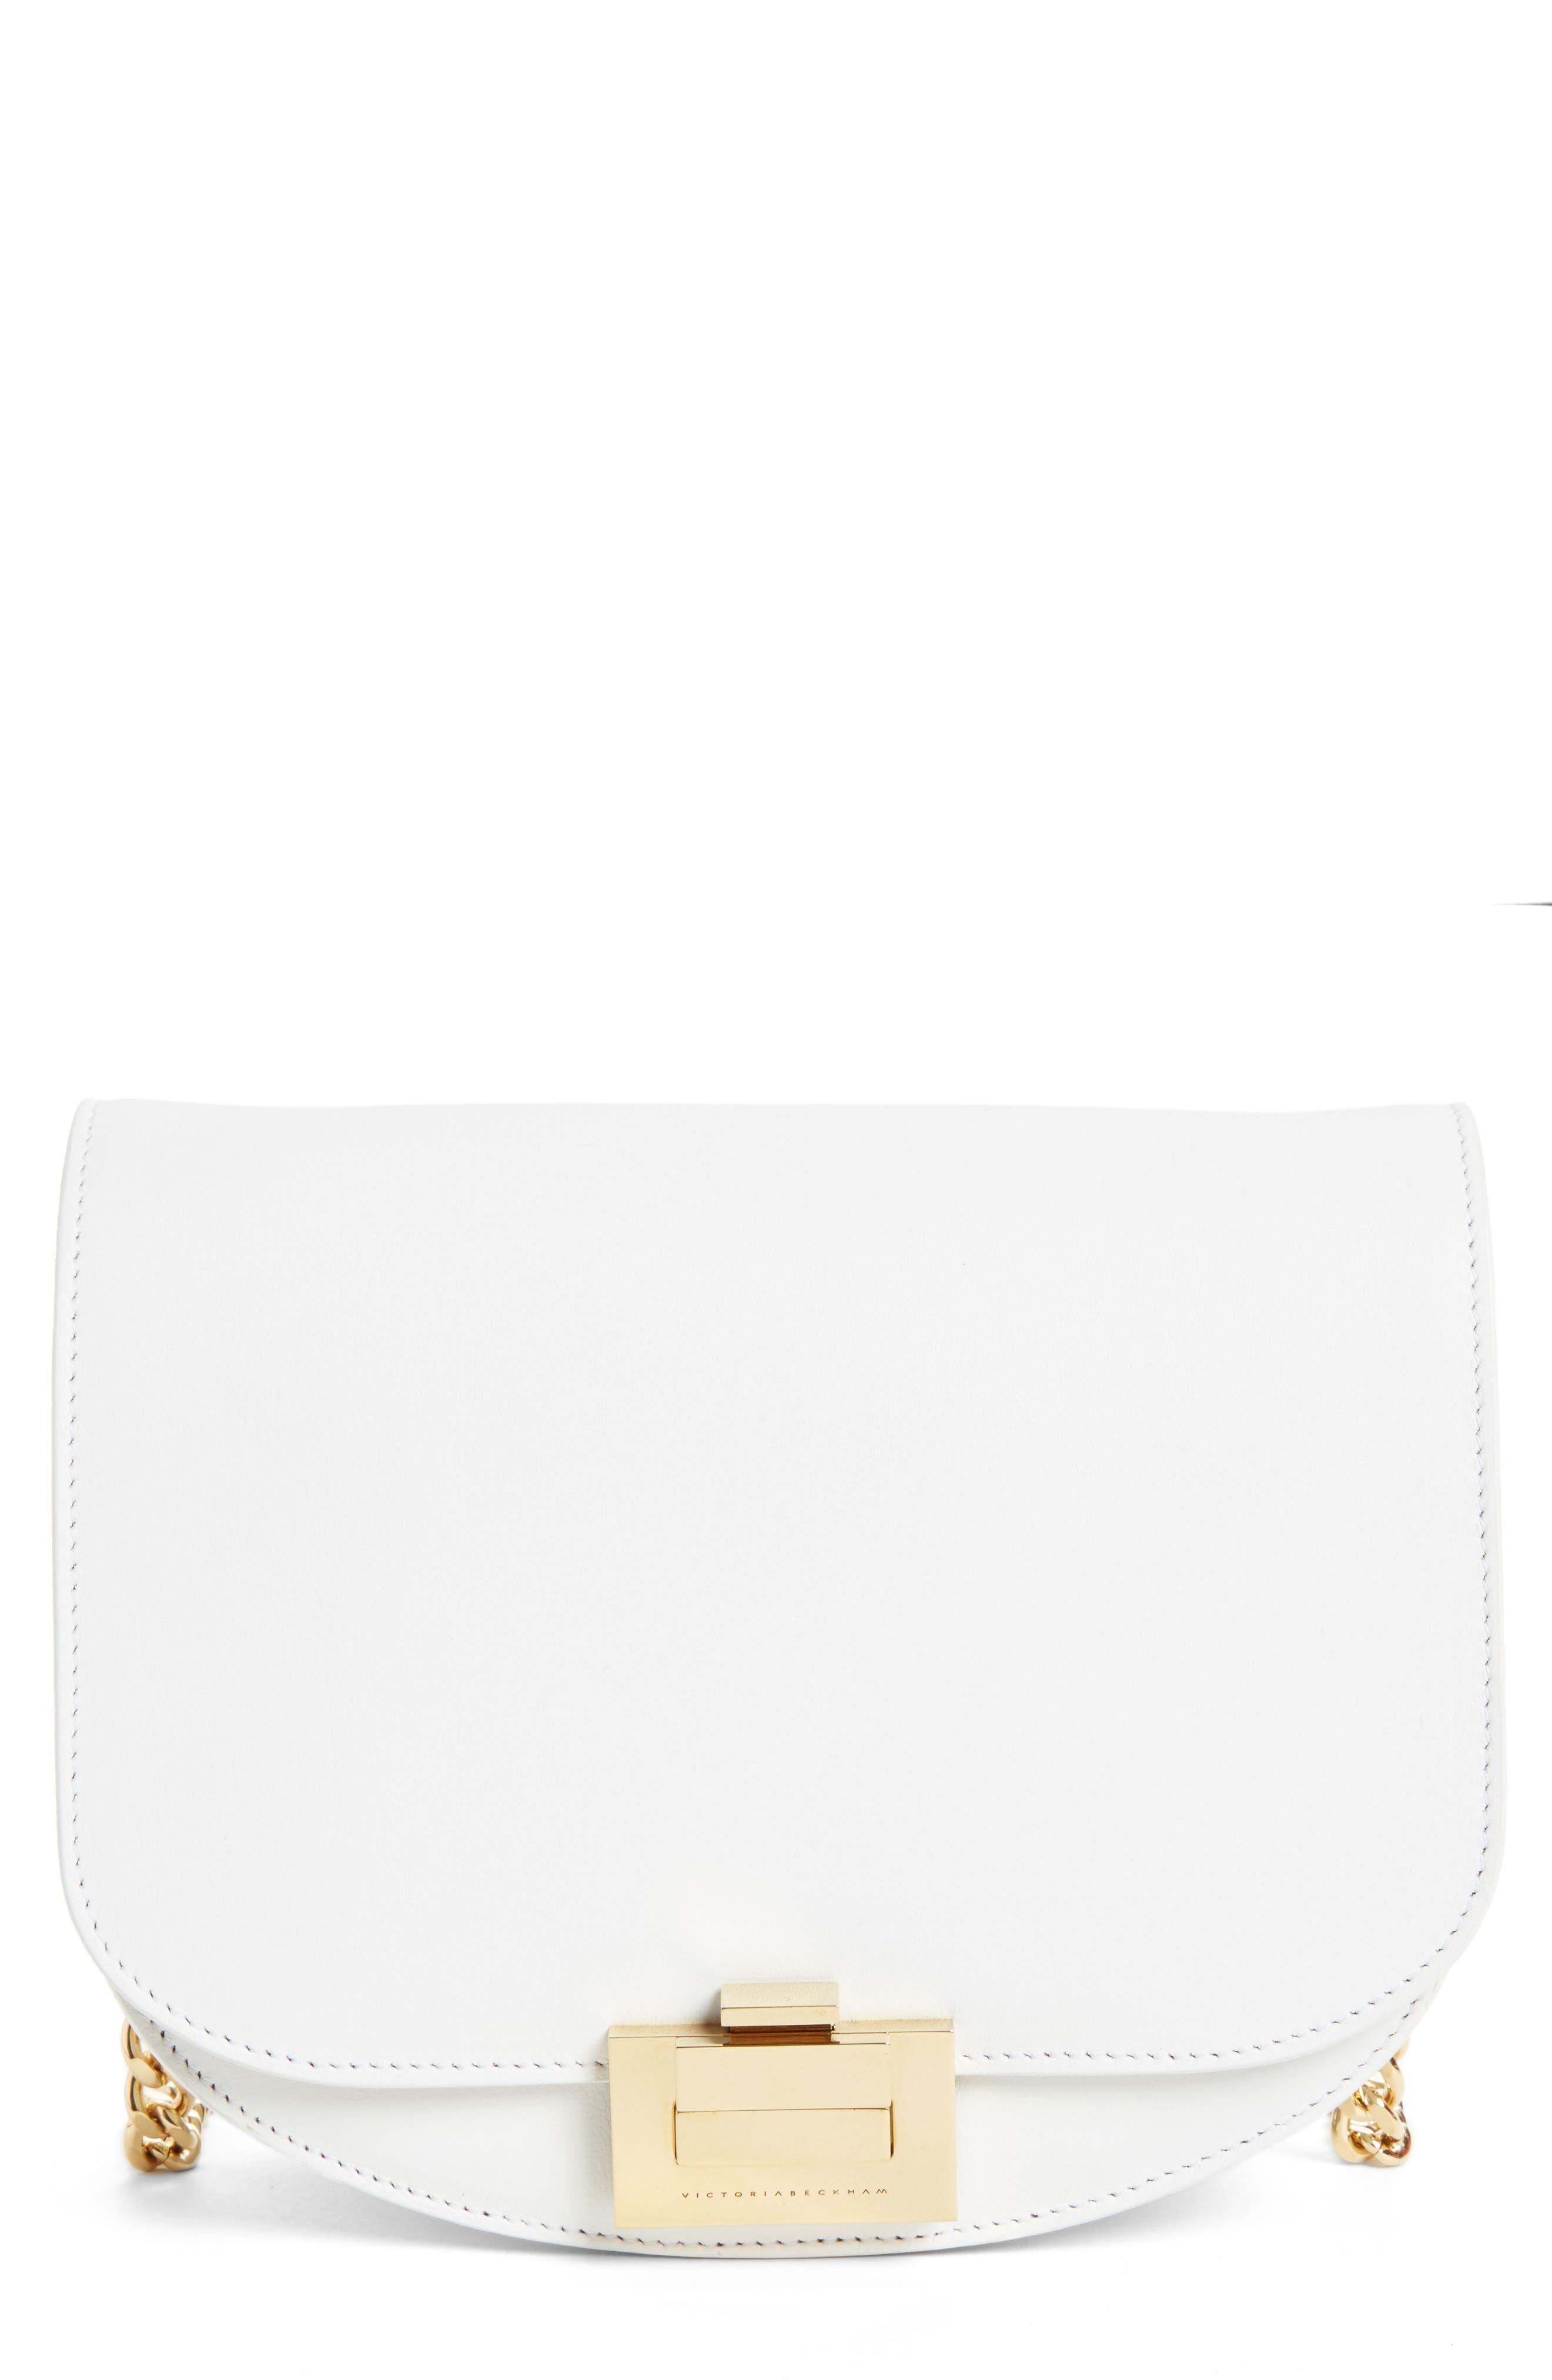 Alternate Image 1 Selected - Victoria Beckham Leather Bag